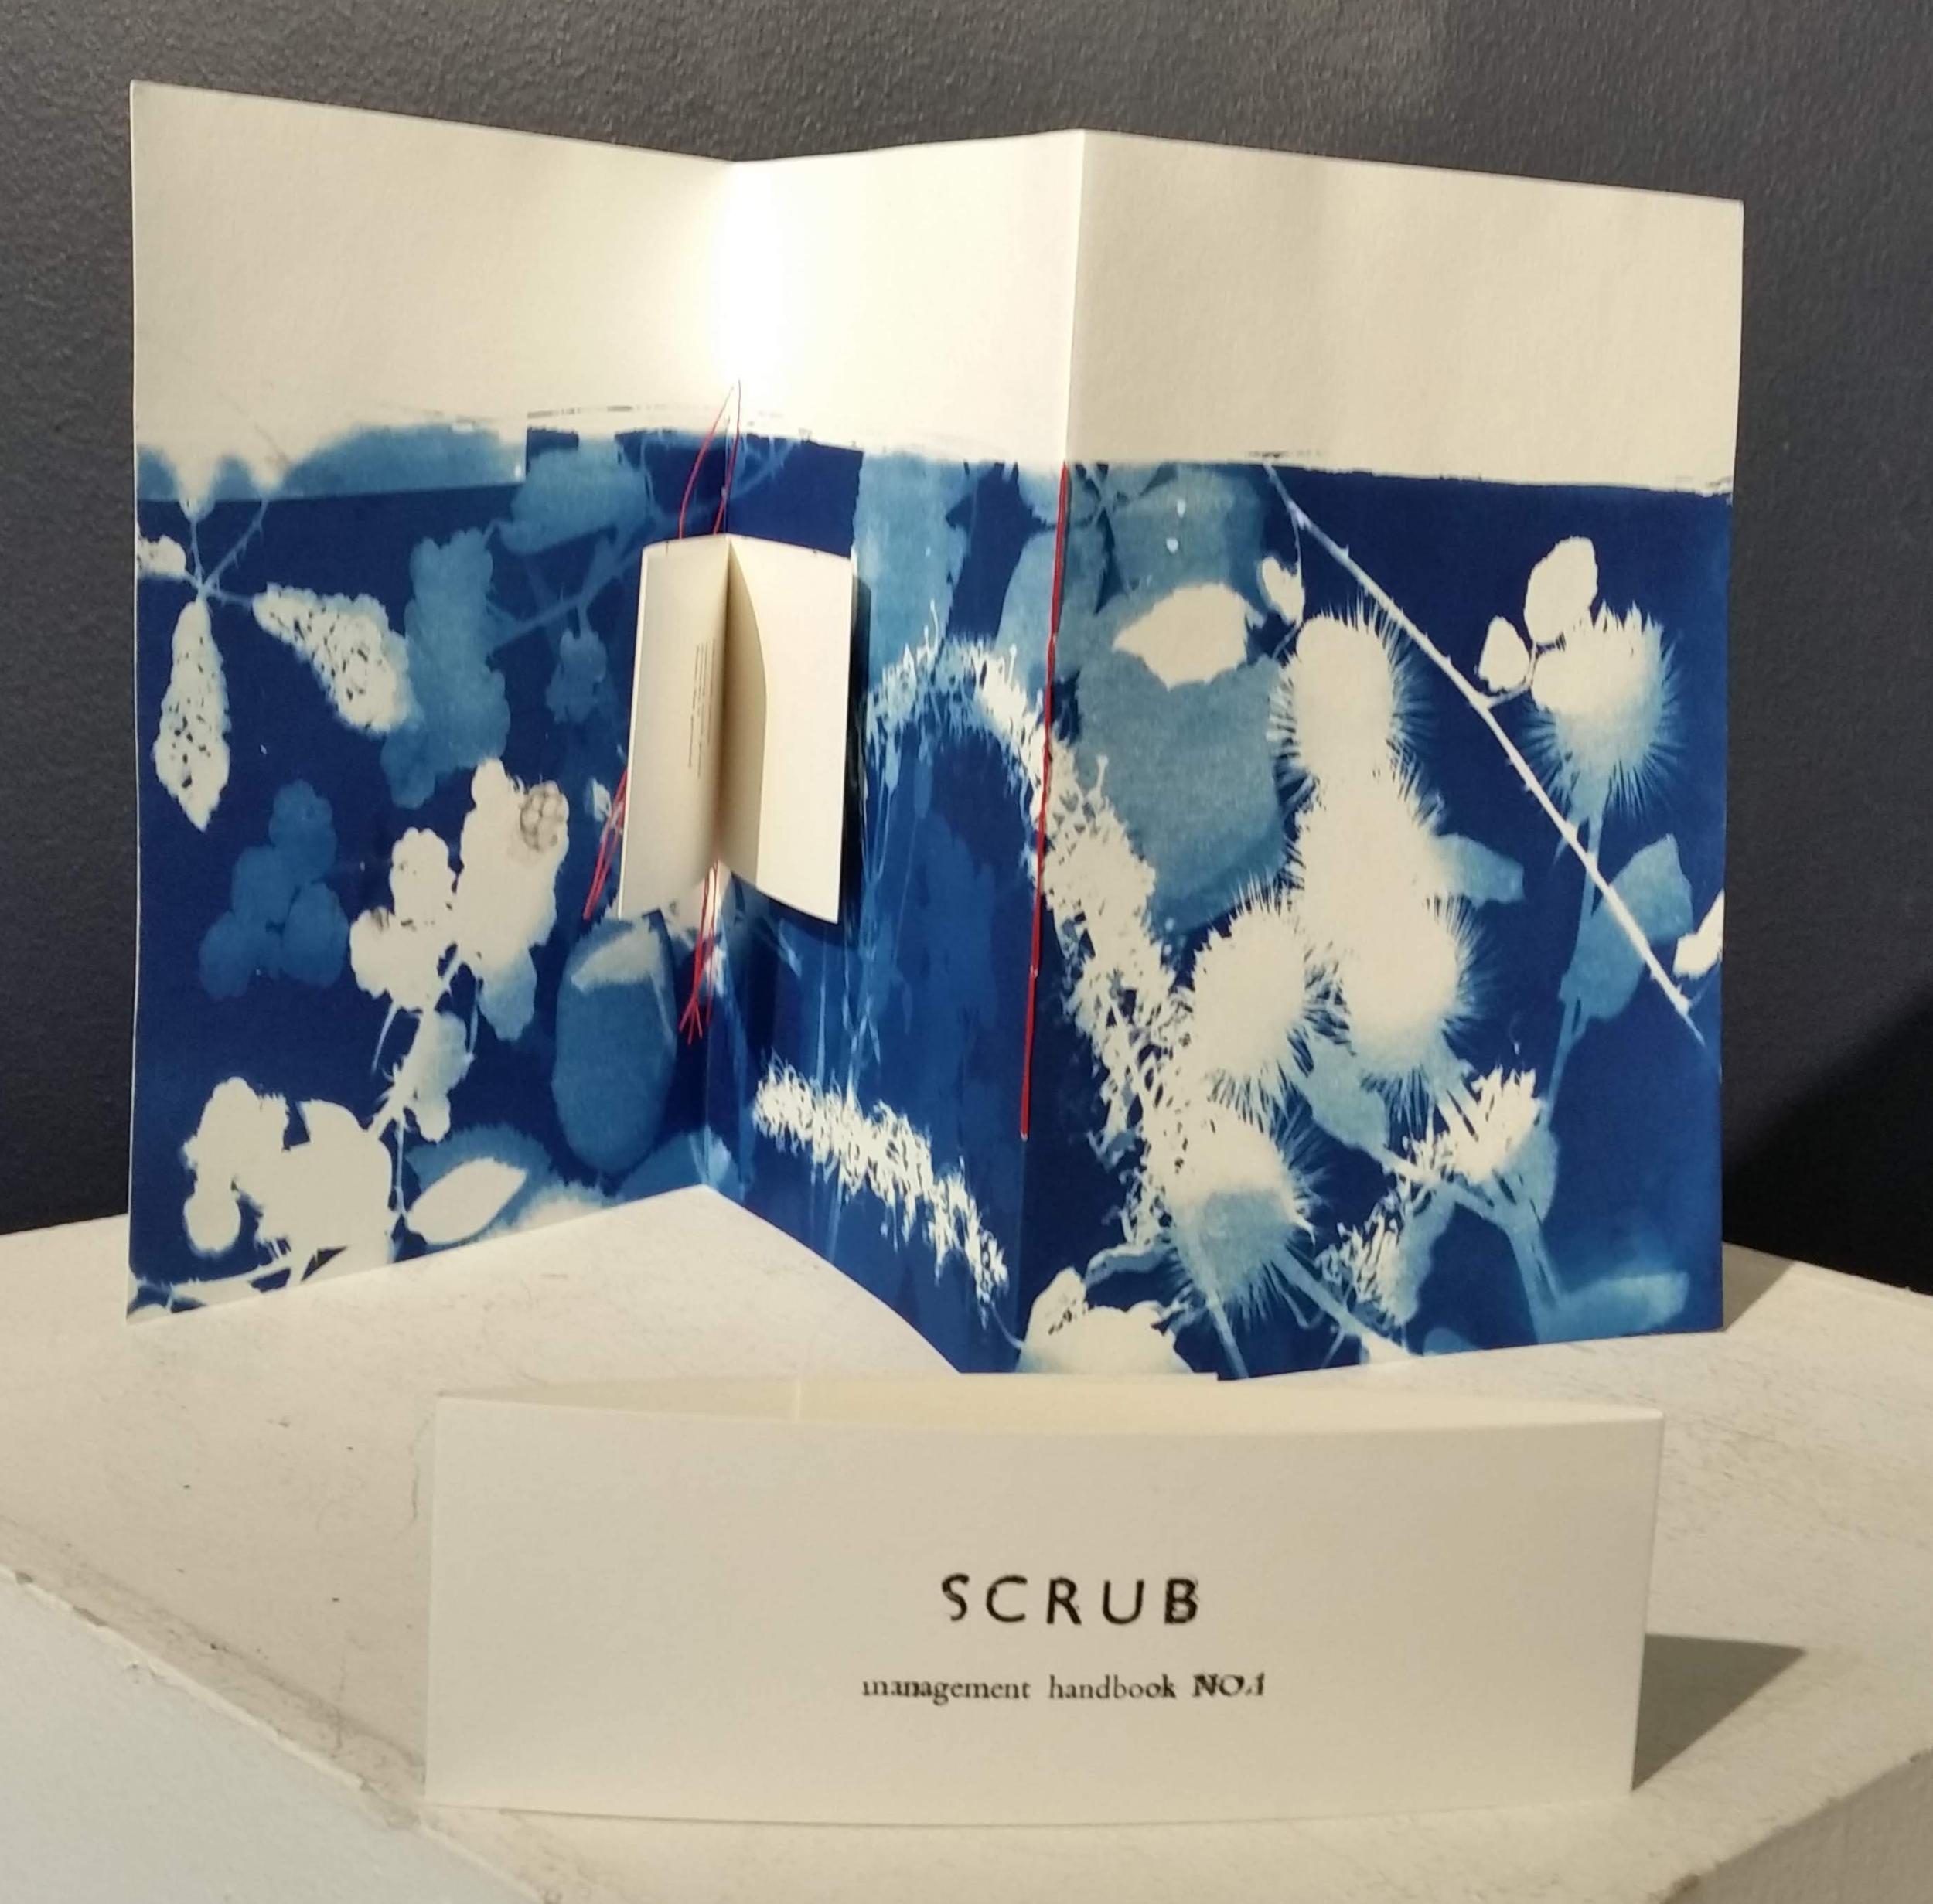 SCRUB: A Management Handbook (2018) by Caroline Harris